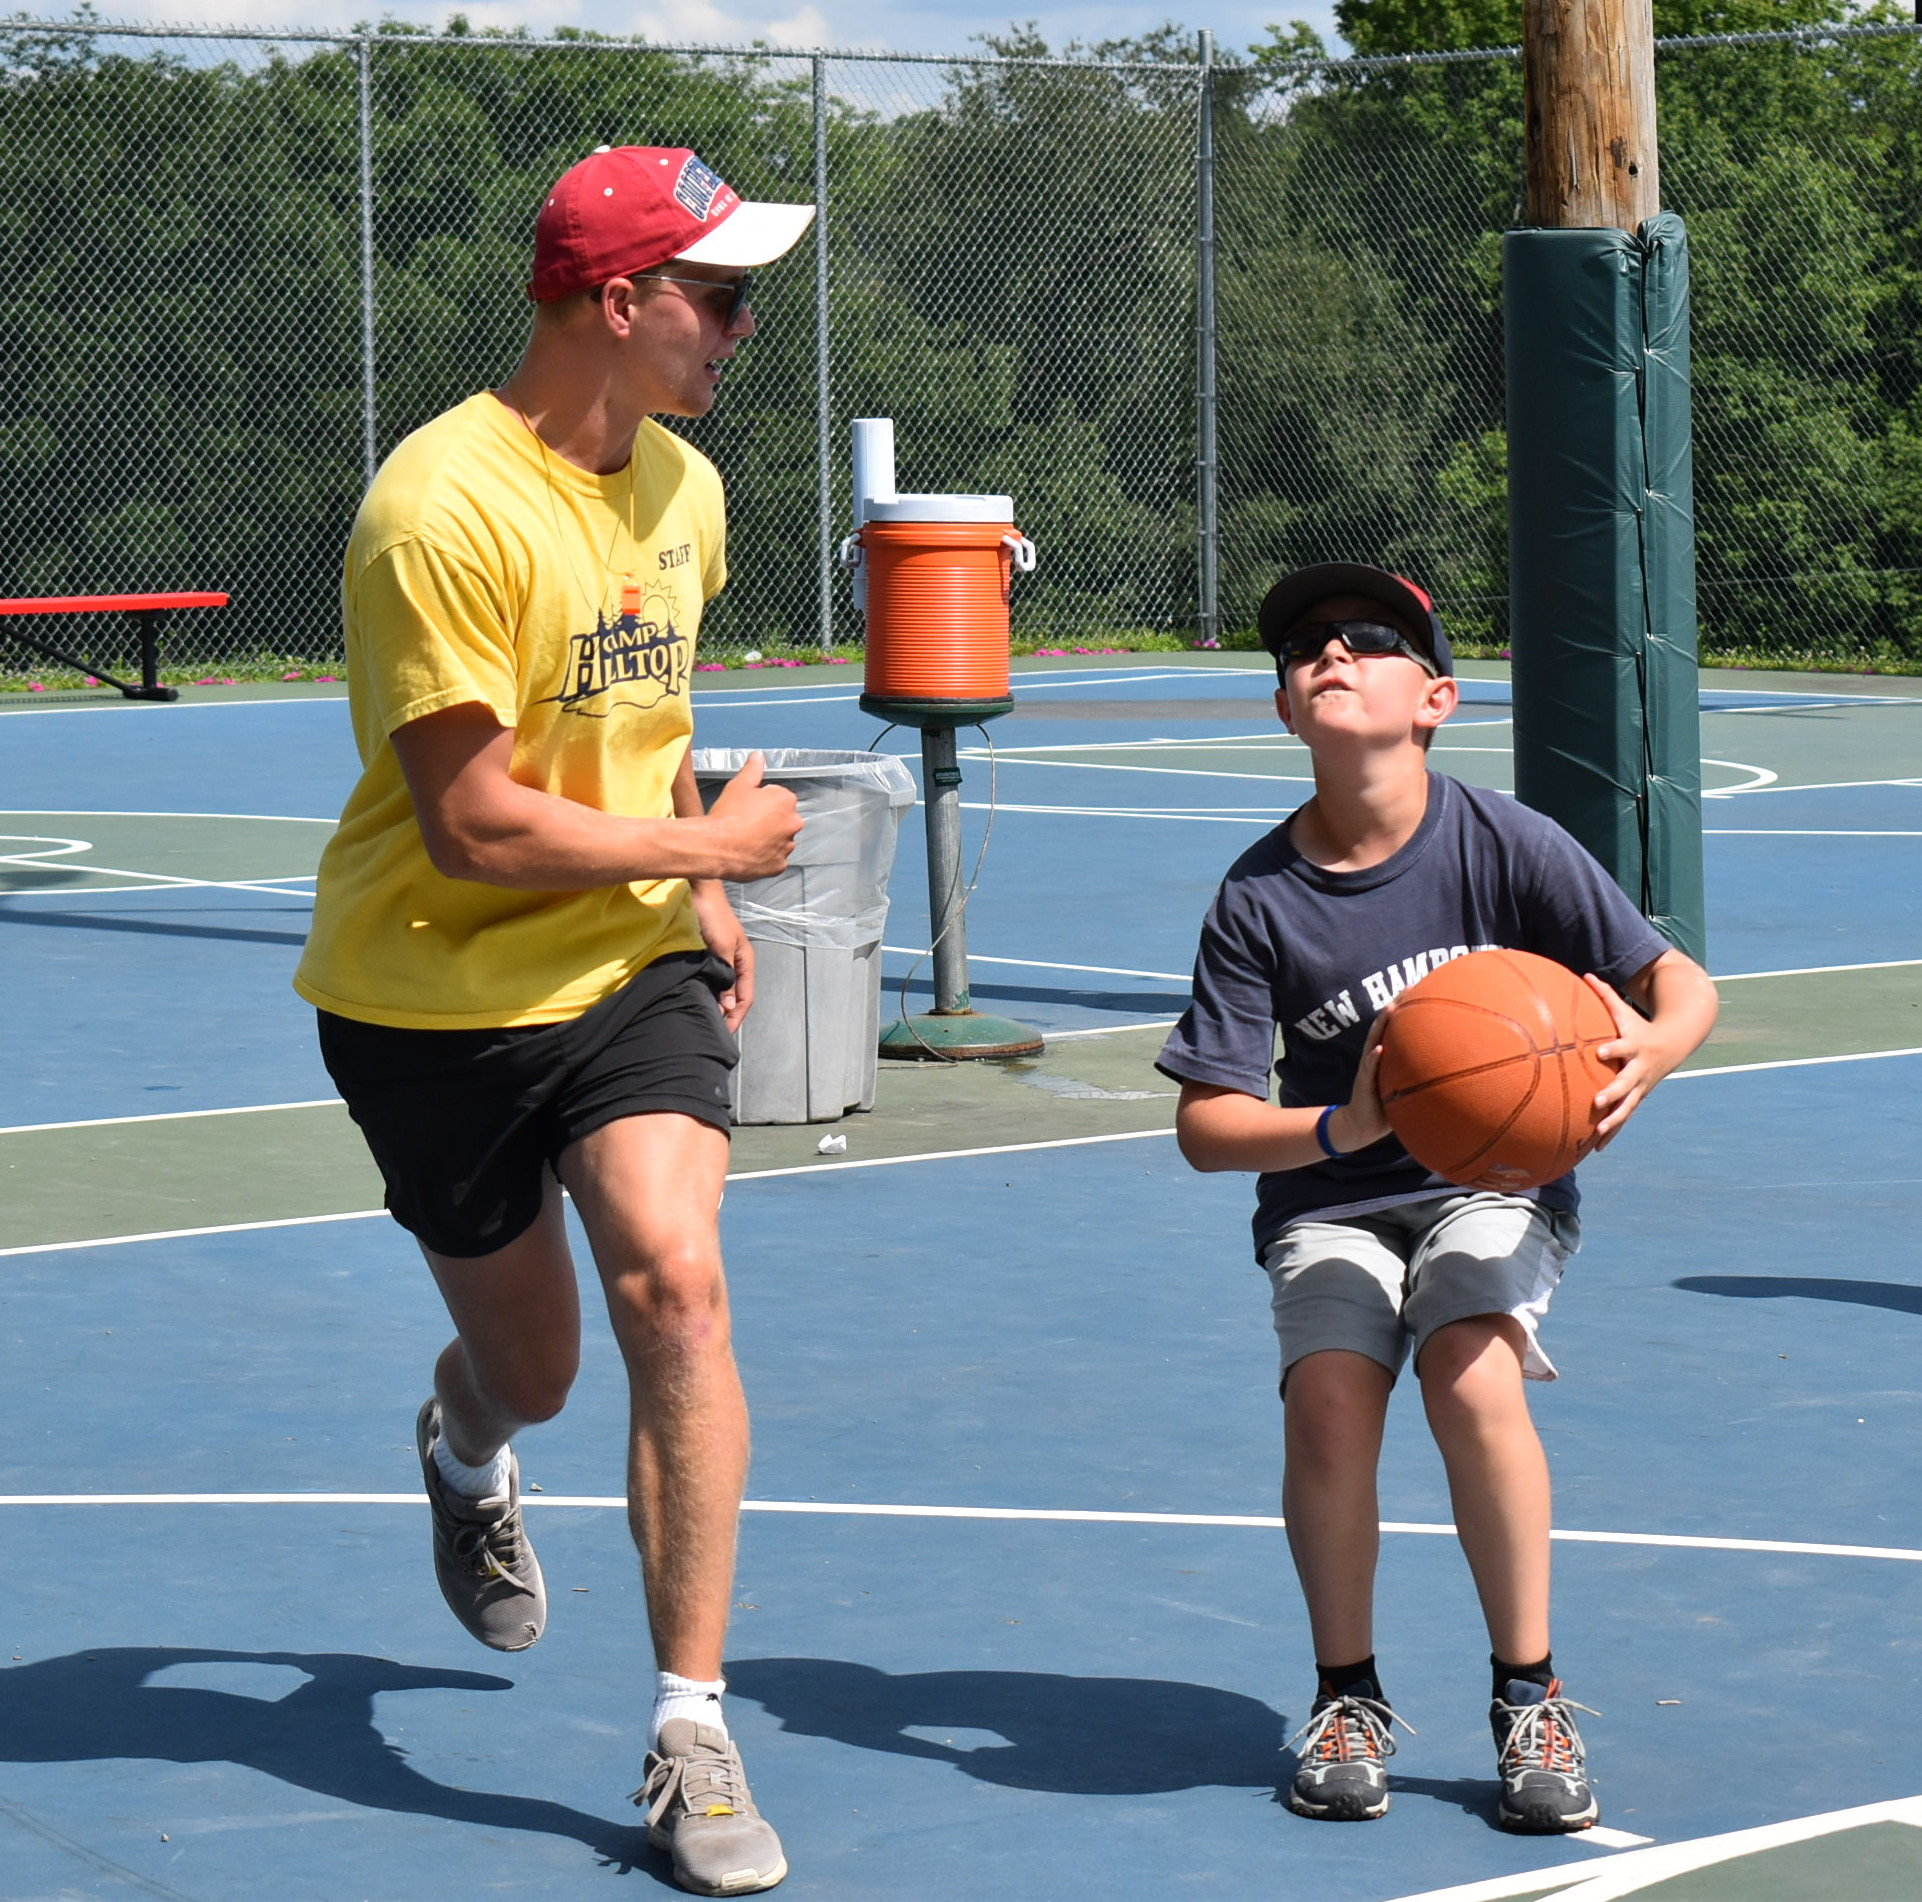 Camp Hilltop - Basketball